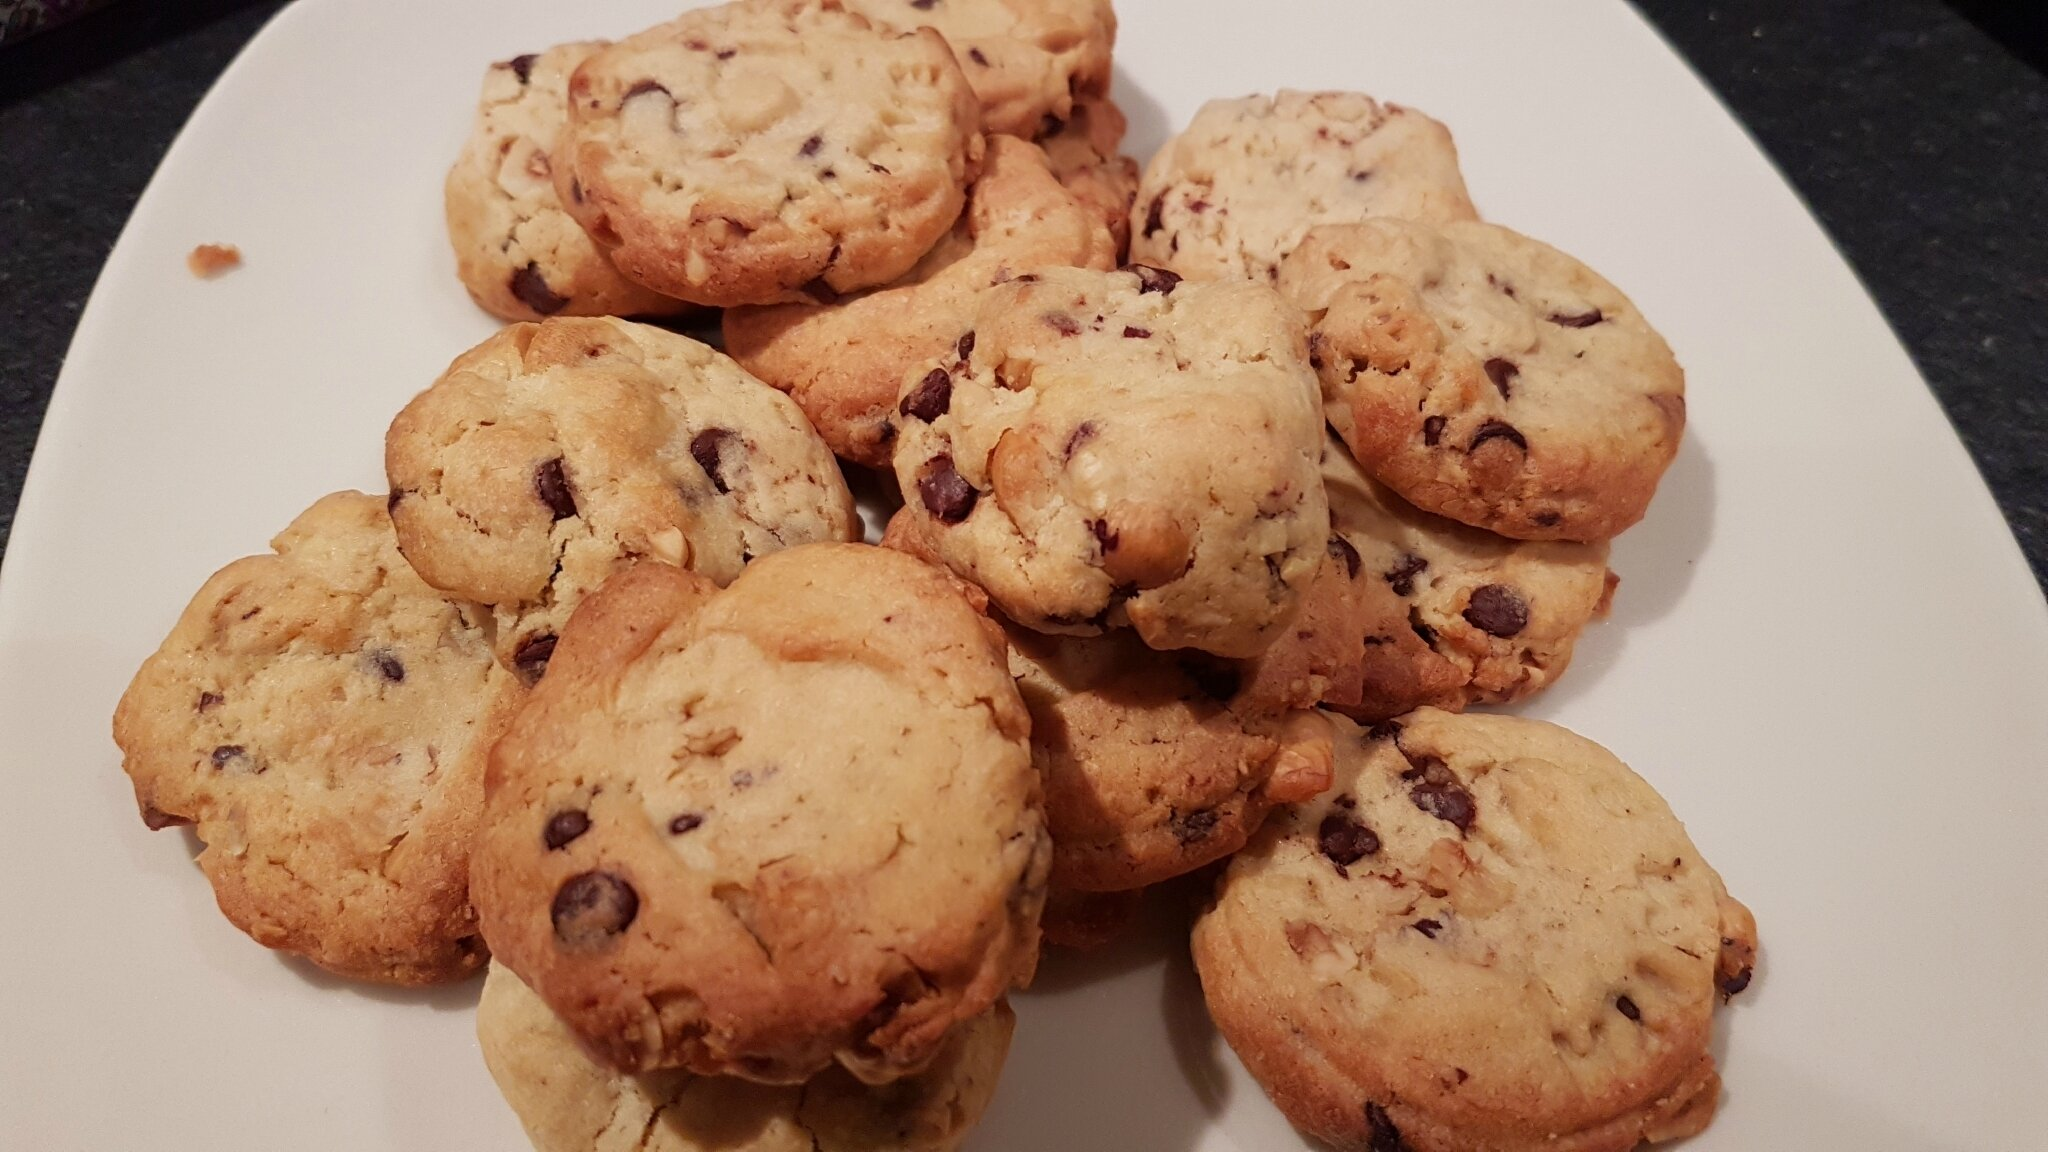 Les cookies de @ghostsurfer69